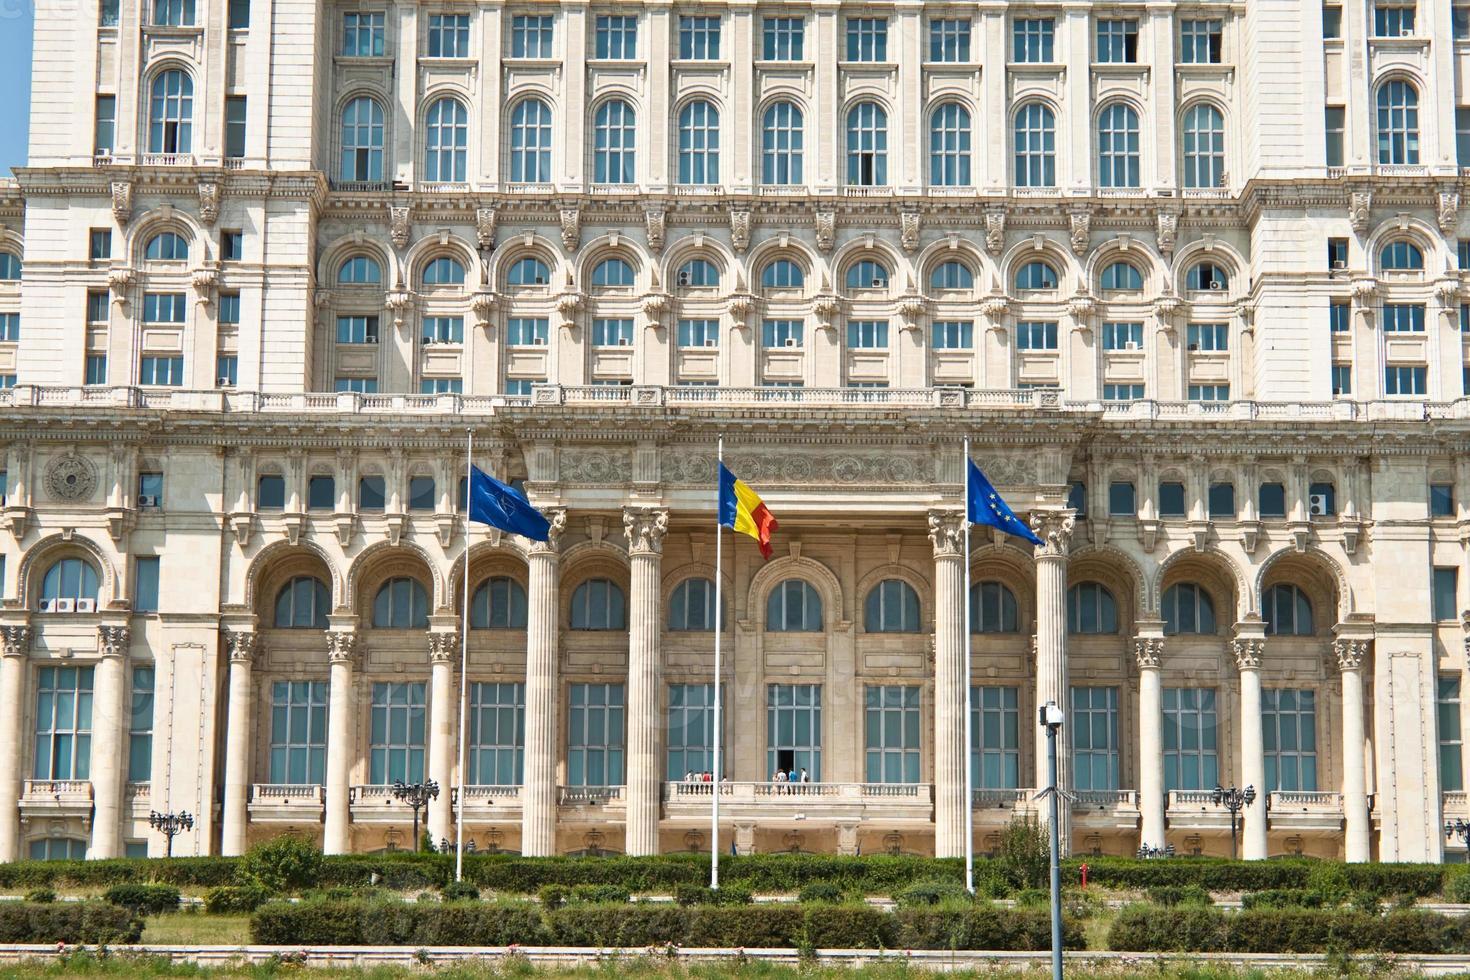 Paleis van het parlement vooraanzicht, Boekarest Roemenië foto